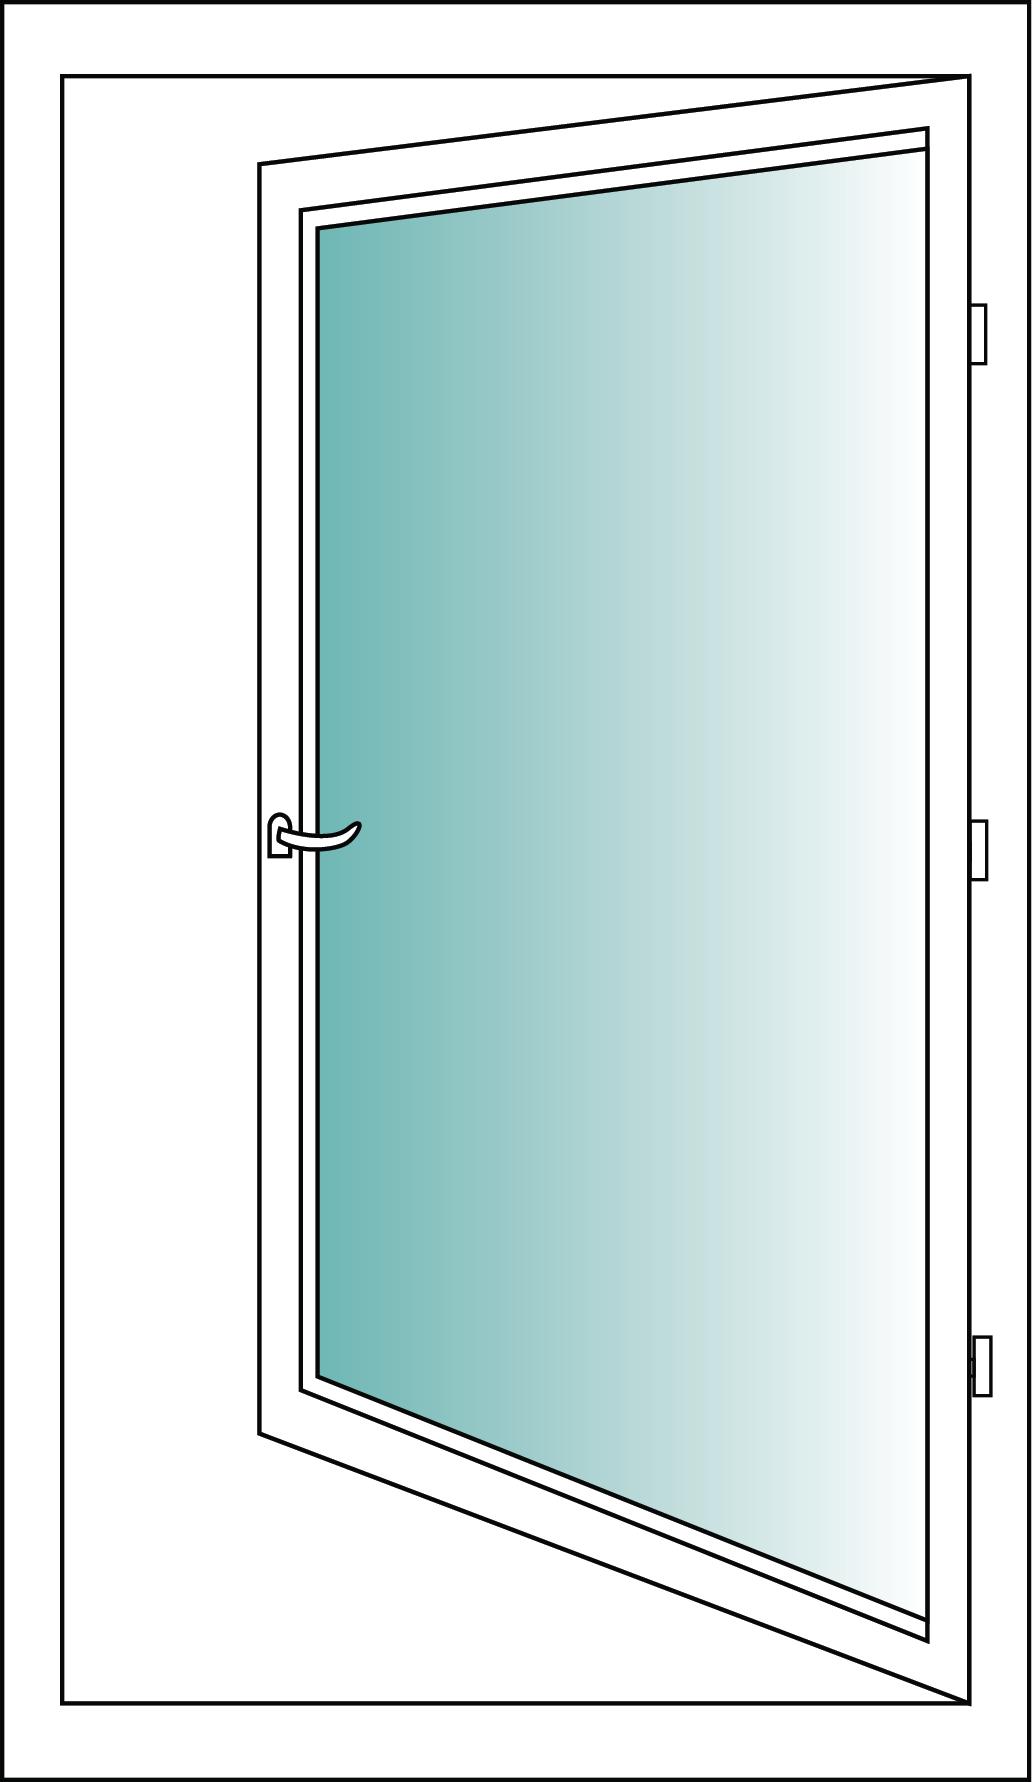 Upvc And Pvc Doors Service And Installation Prompt Trivandrum With Images Pvc Door Upvc Upvc Windows